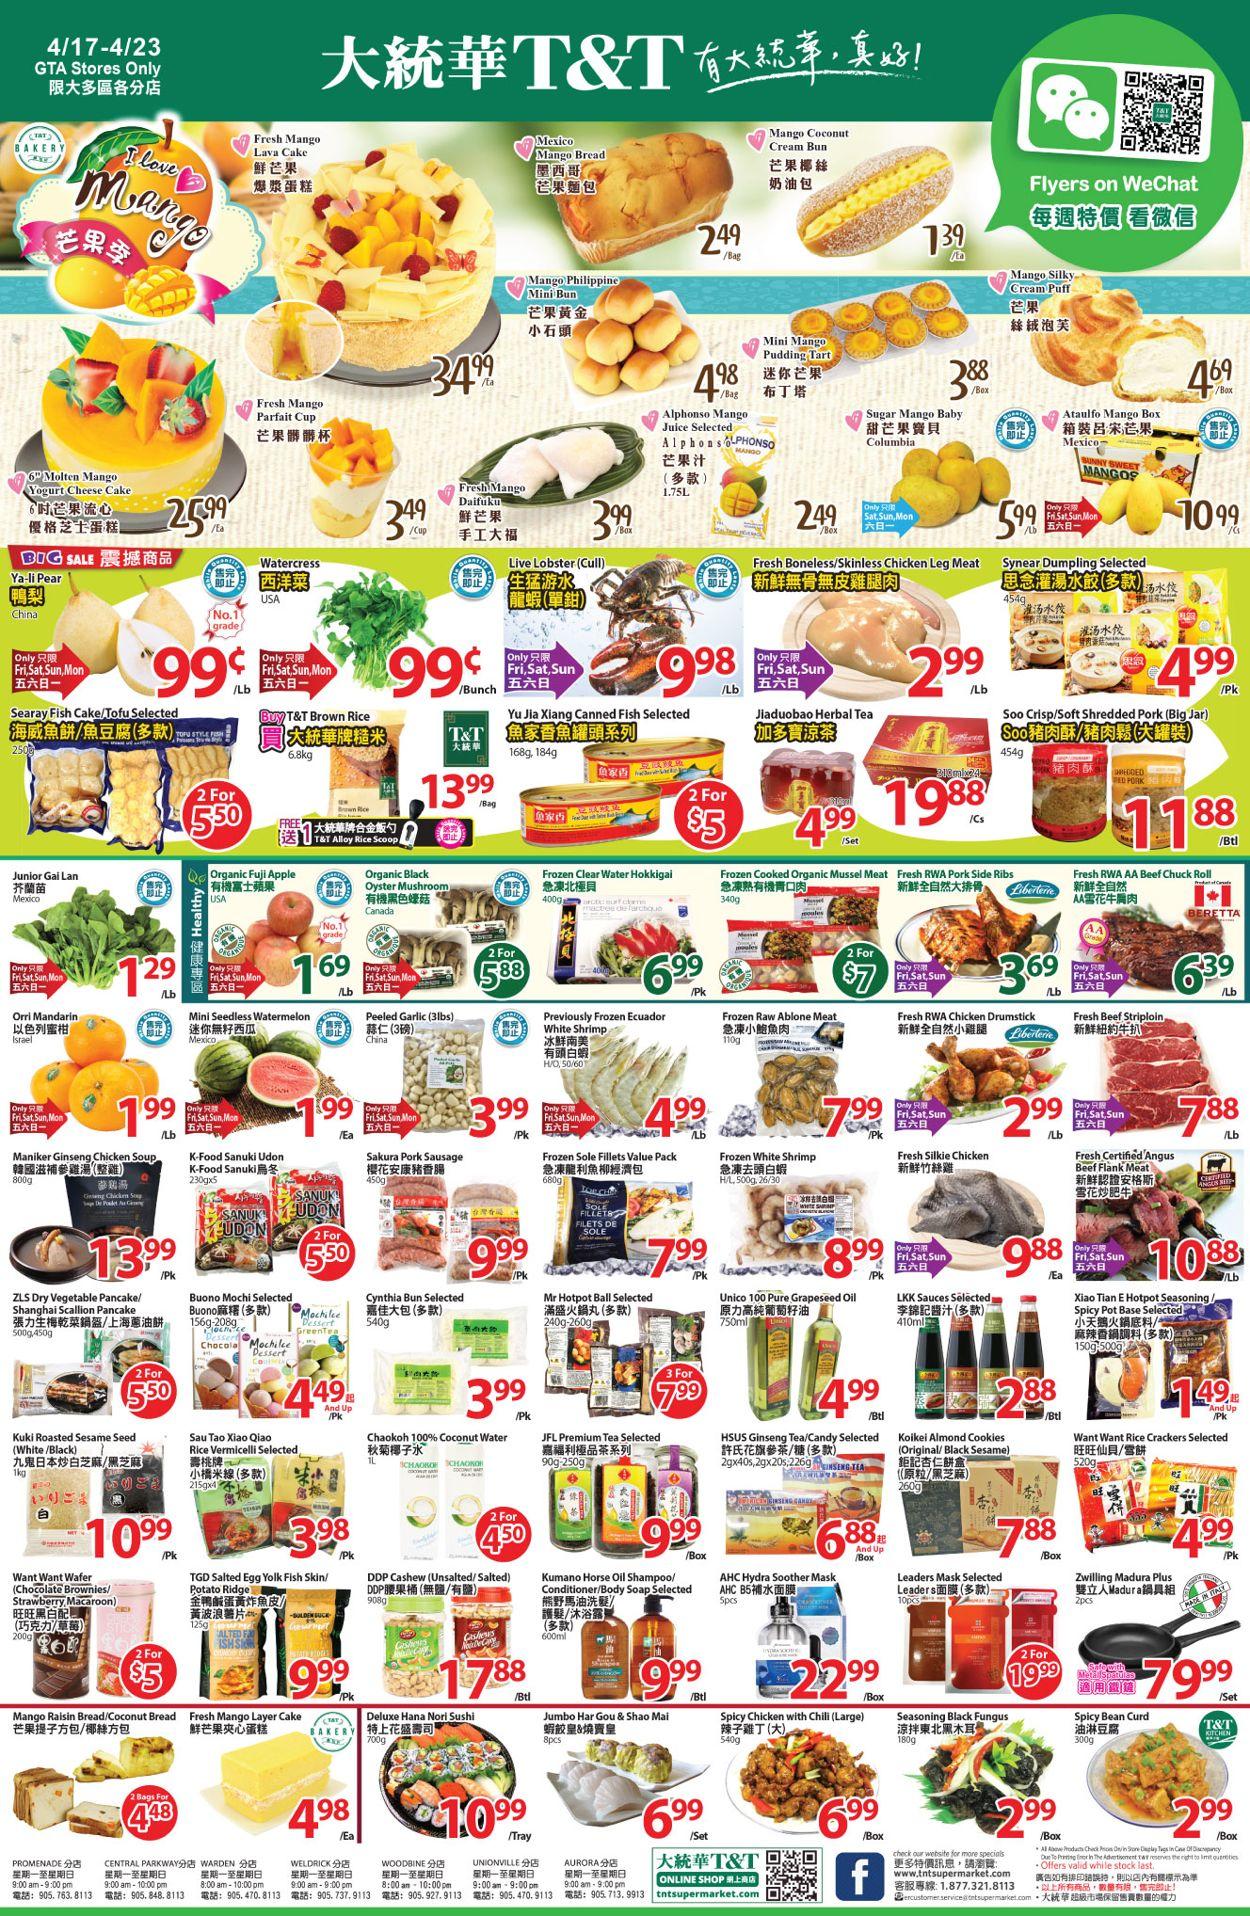 T&T Supermarket Flyer - 04/17-04/23/2020